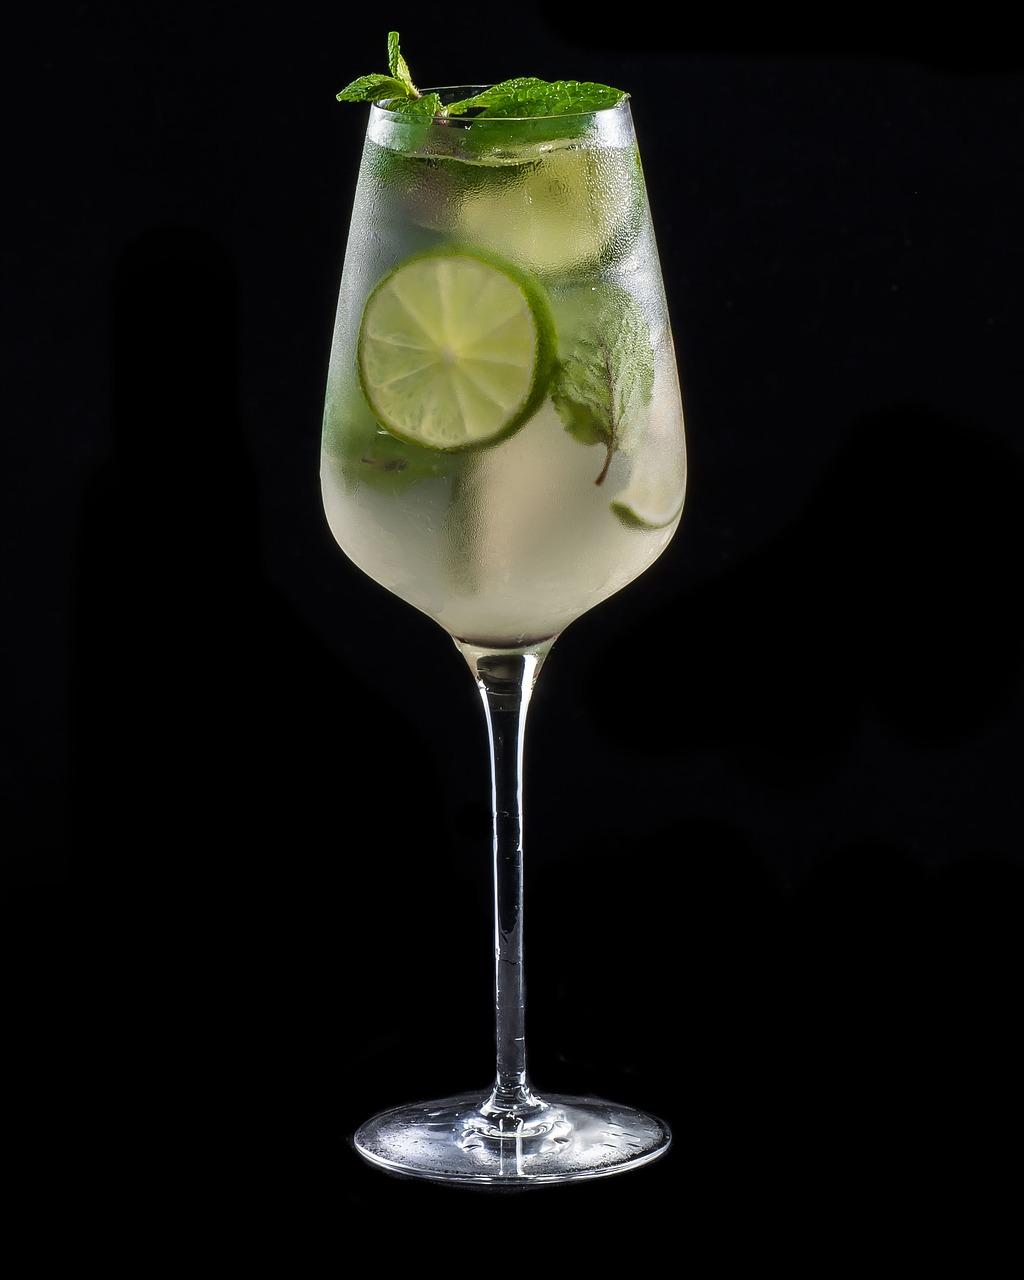 summer-drink-1966290_1280